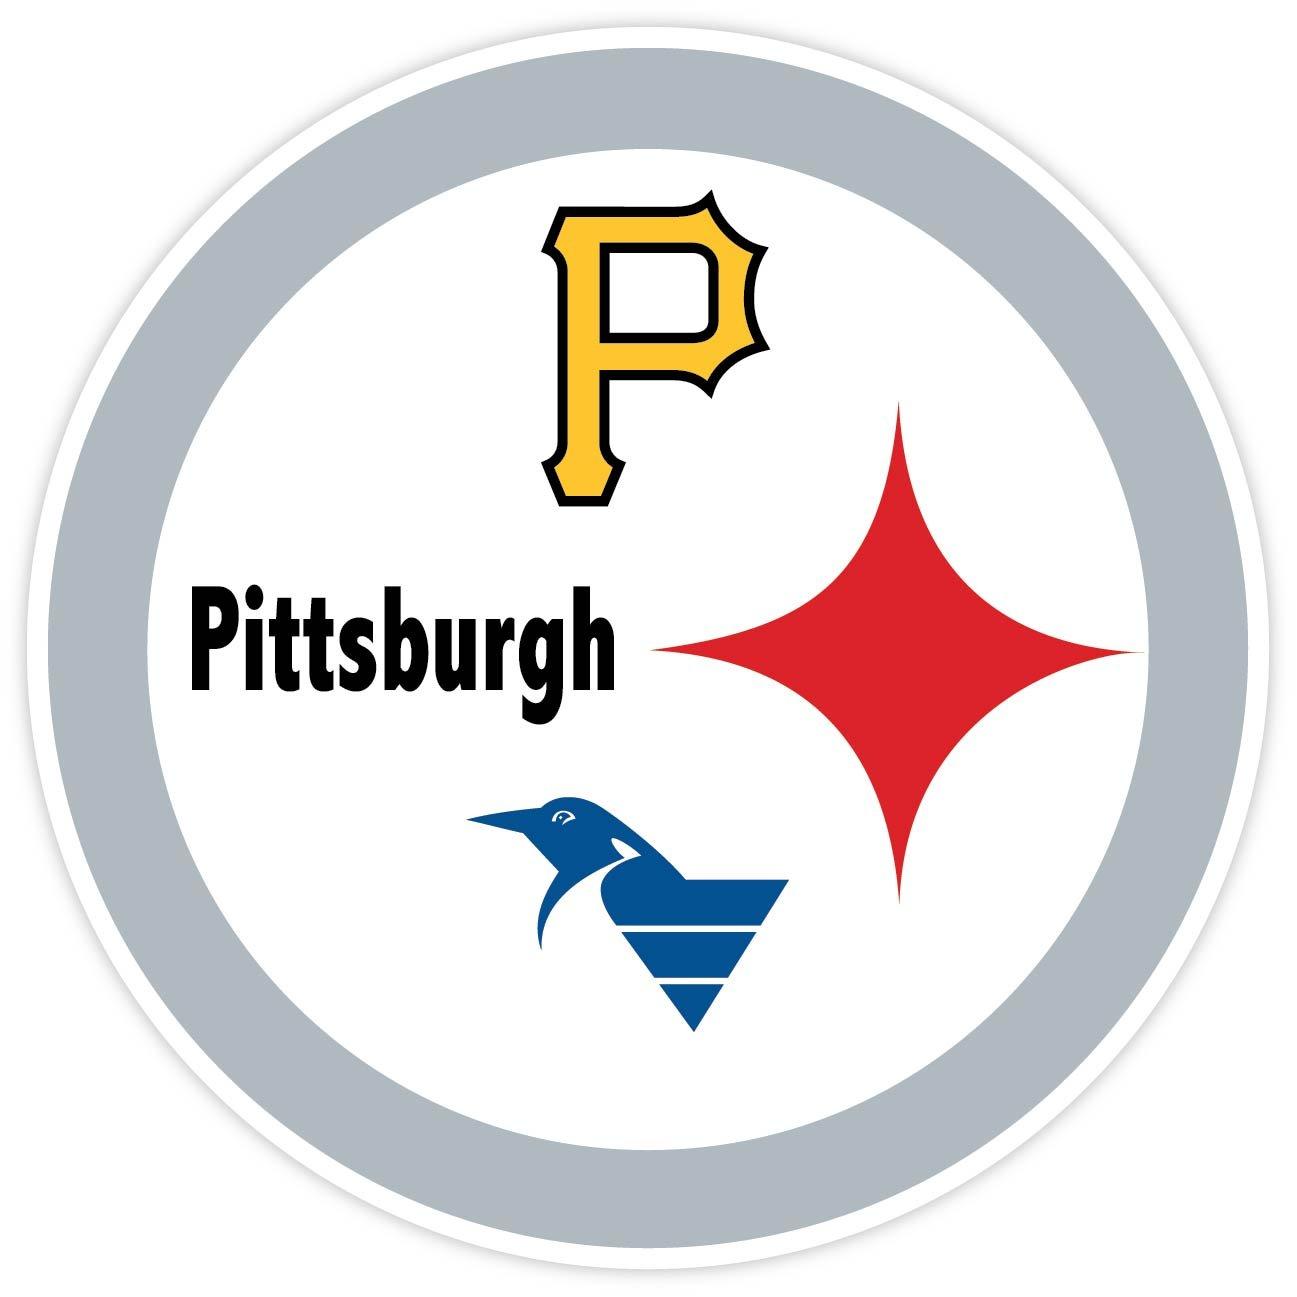 Amazoncom PITTSBURGH Fan Sport Logo X Sticker Decal Vinyl - Window decals for sports